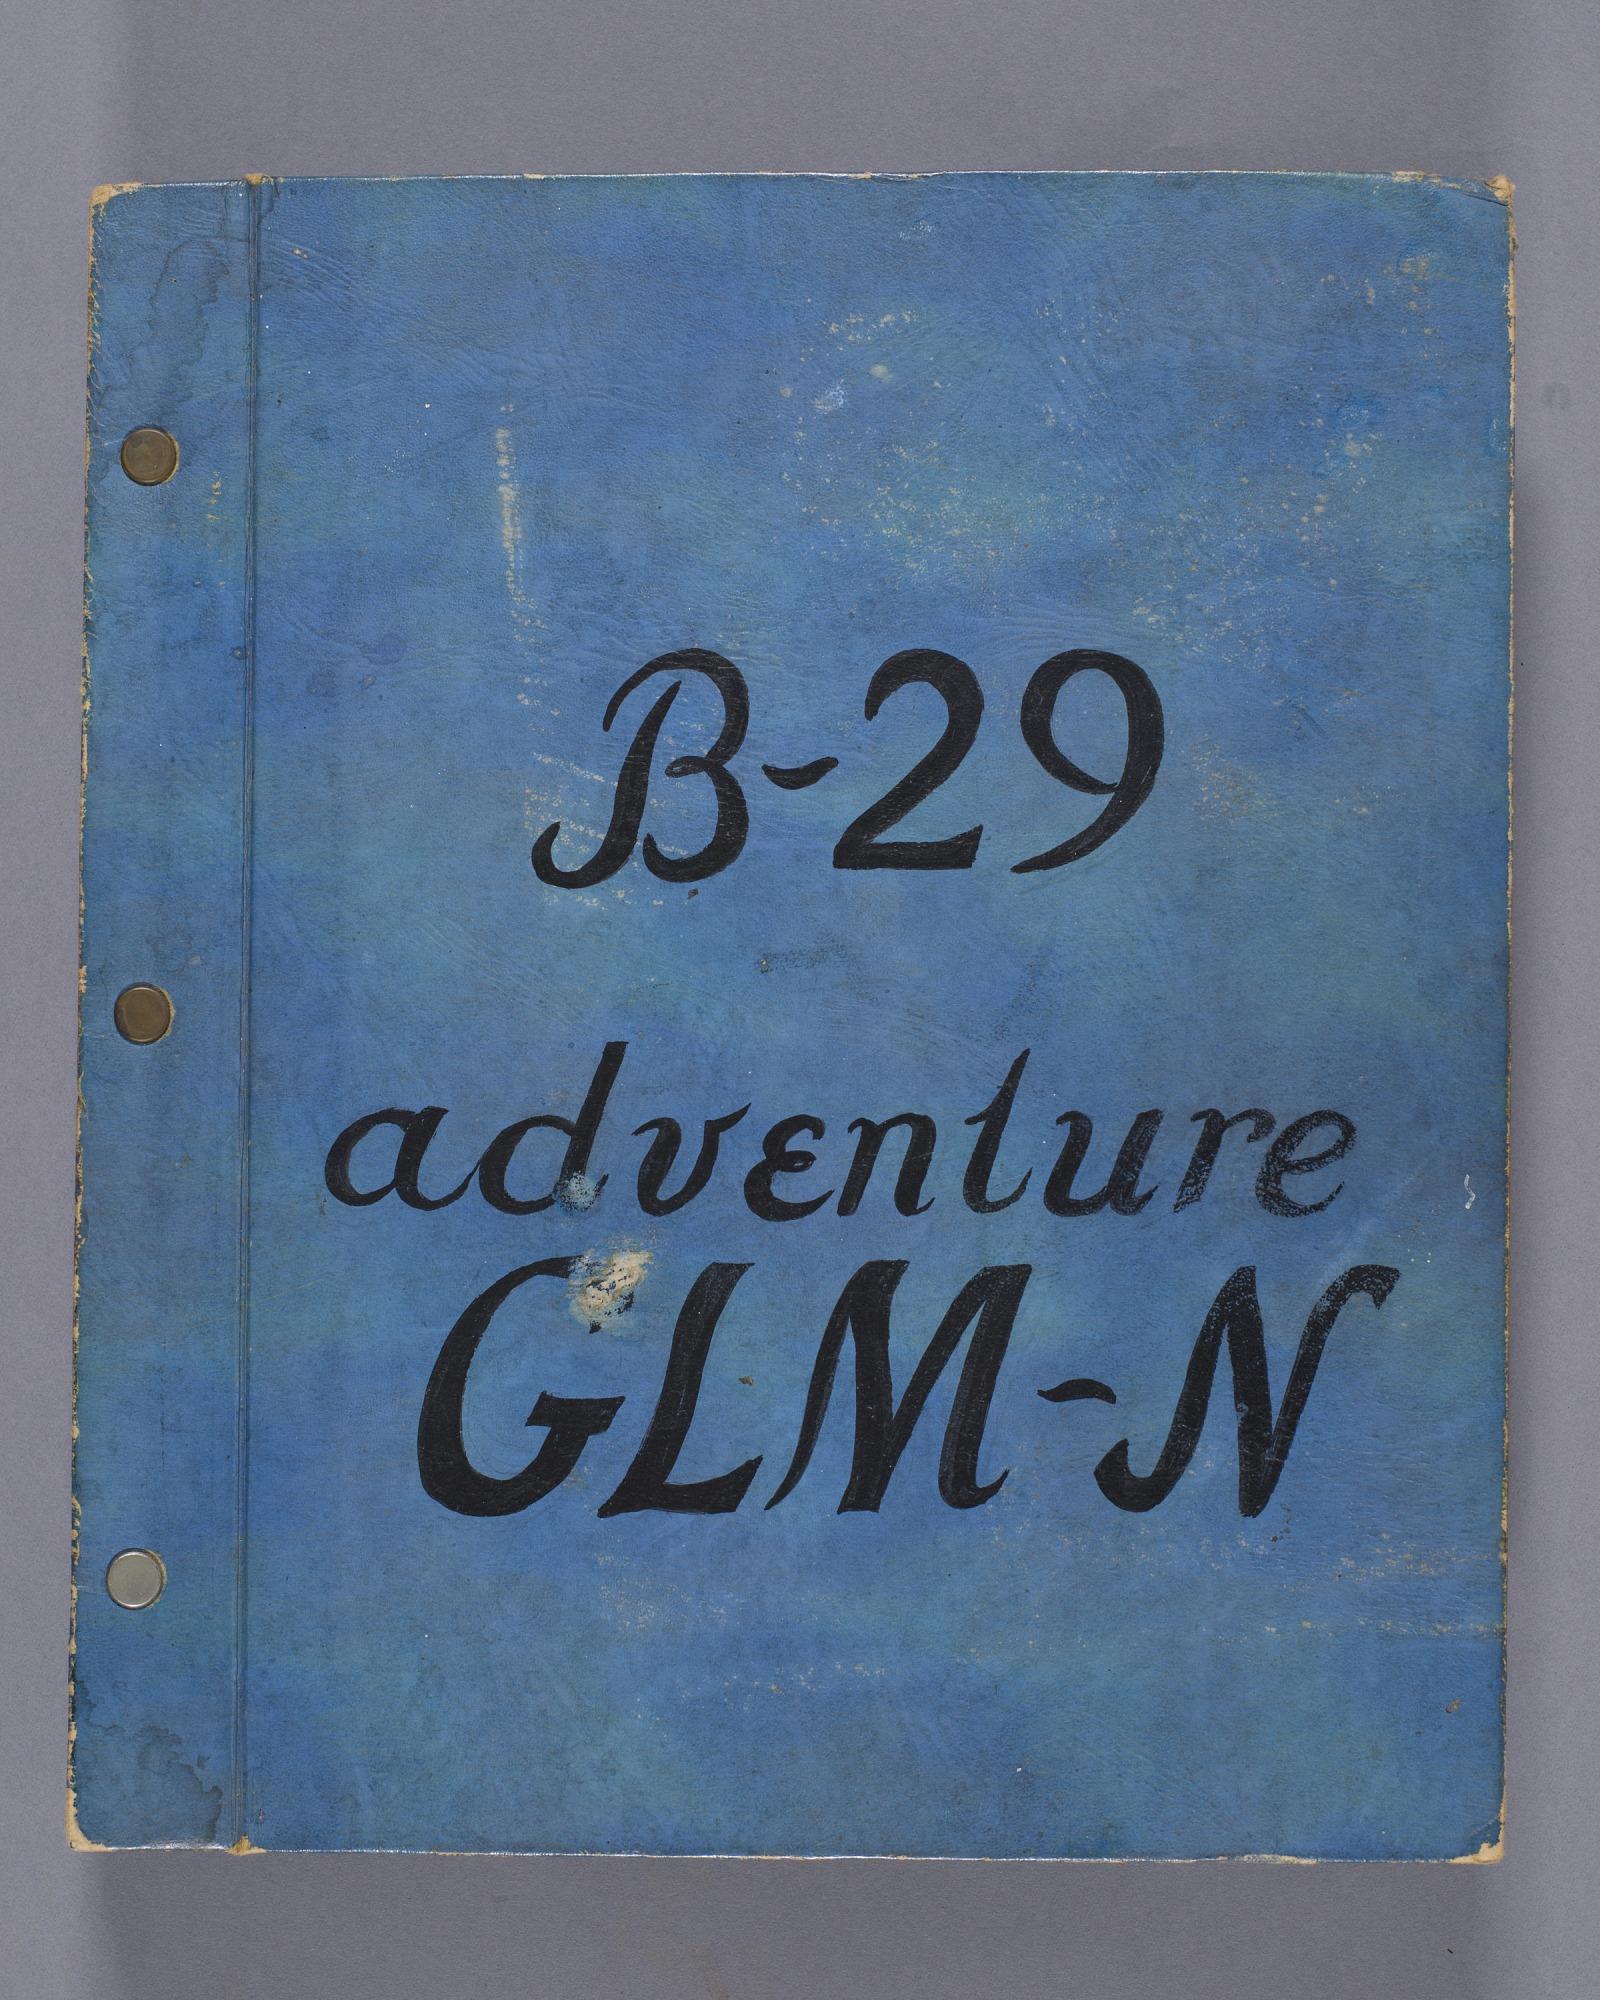 Glenn L. Martin Nebraska Company Scrapbooks (Brown Collection)